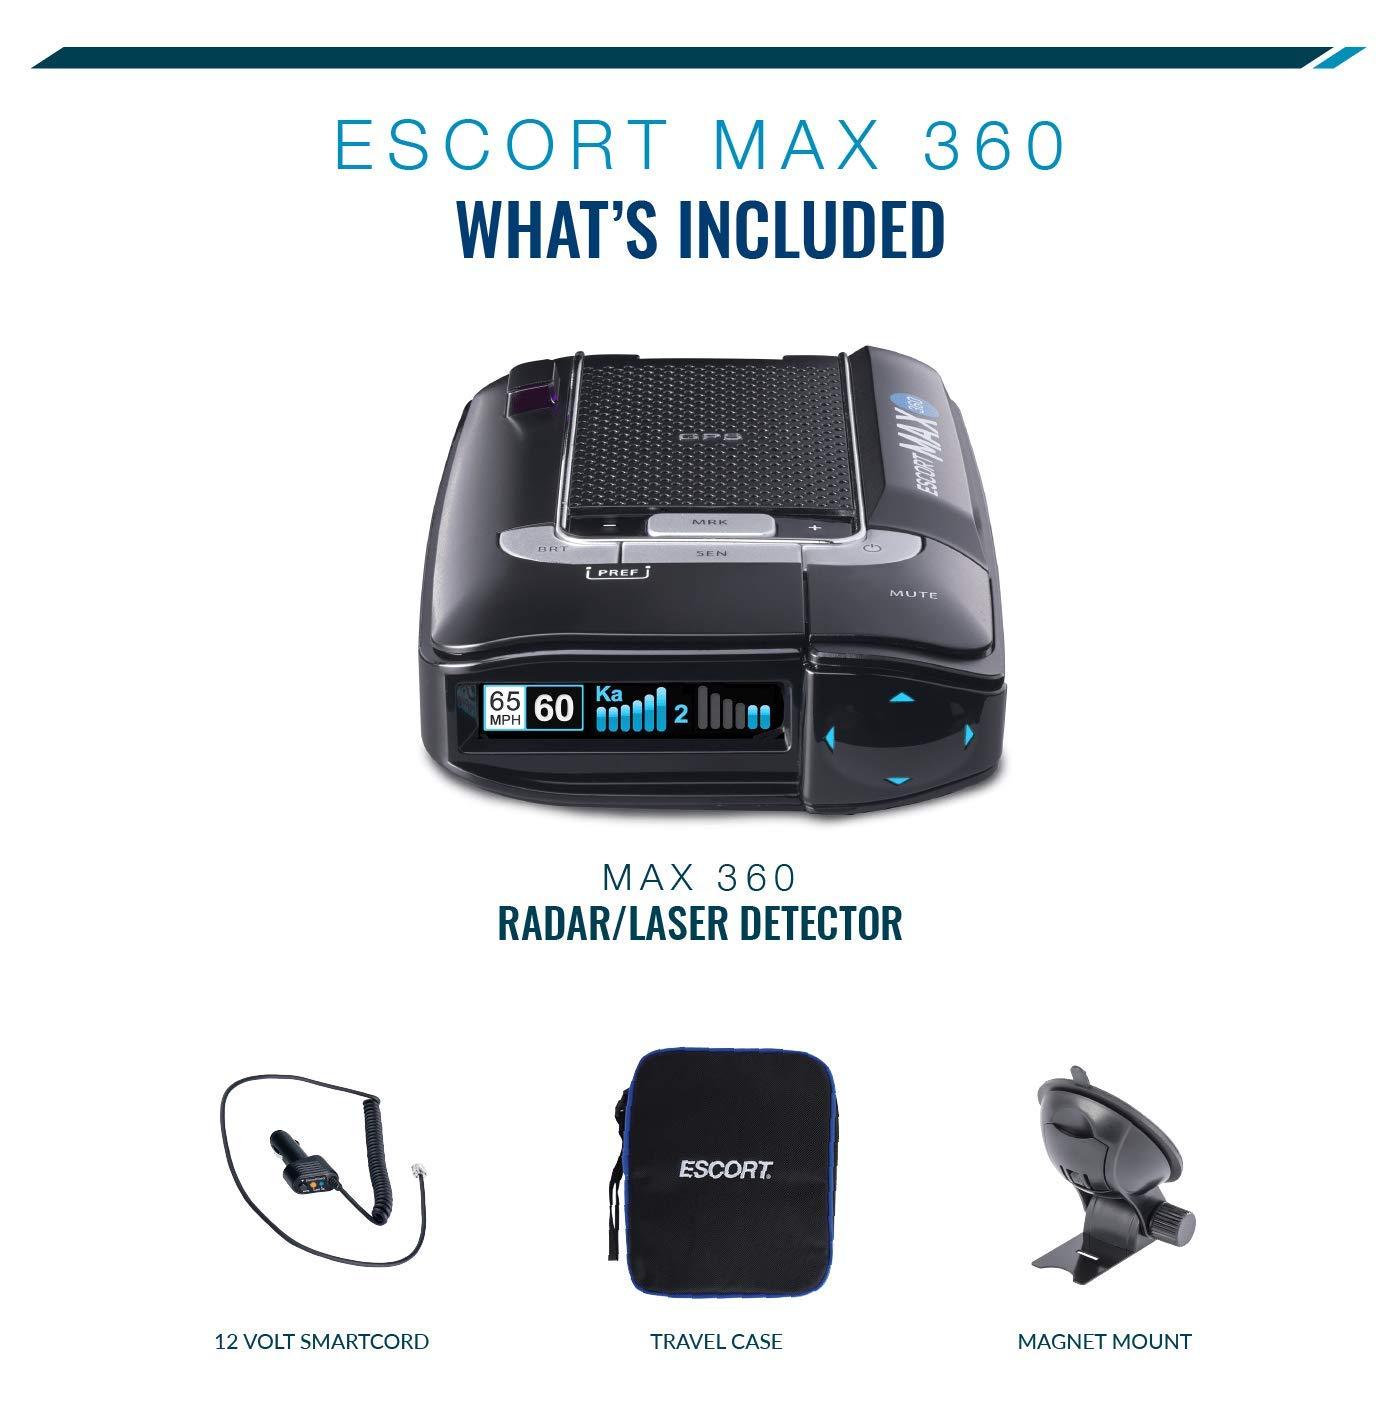 ESCORT MAX360 - Laser Radar Detector, GPS for Fewer False Alerts, Lightning Fast Response, Directional Alerts, Dual Antenna Front and Rear, Bluetooth, Voice Alerts, OLED Display, Escort Live! by Escort (Image #2)